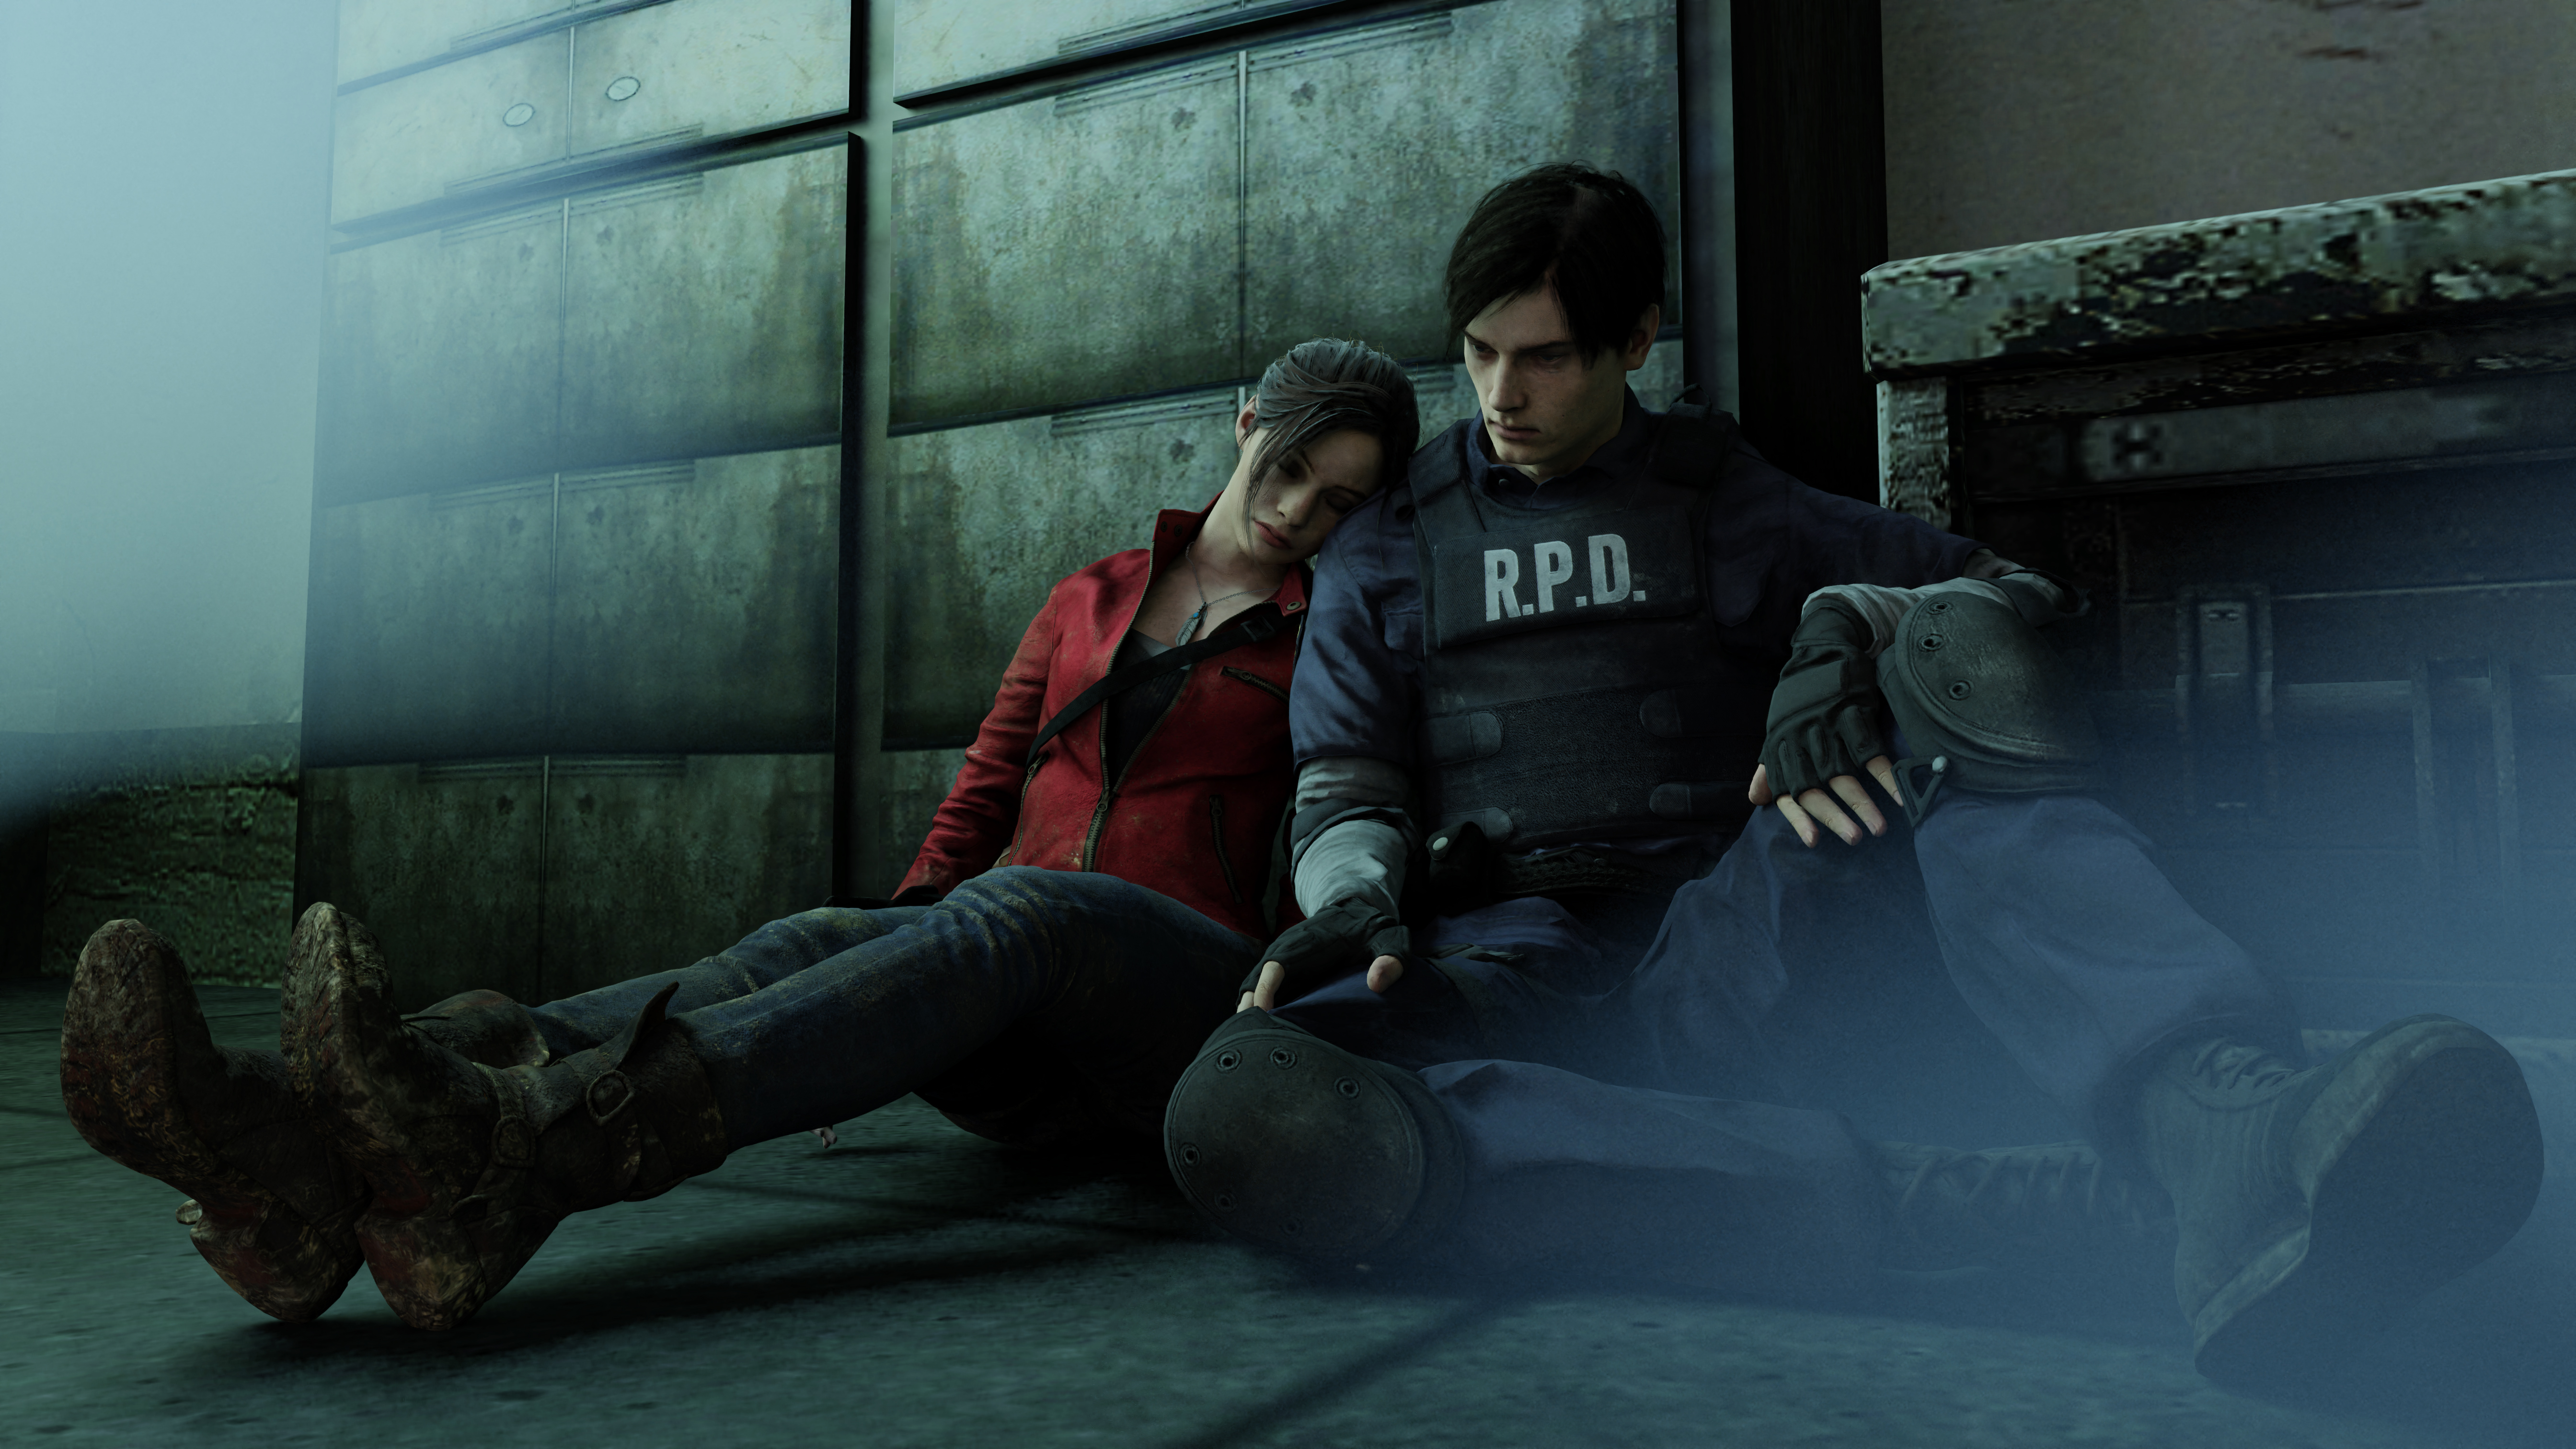 Resident Evil 2 5k, HD Games, 4k Wallpapers, Images ...